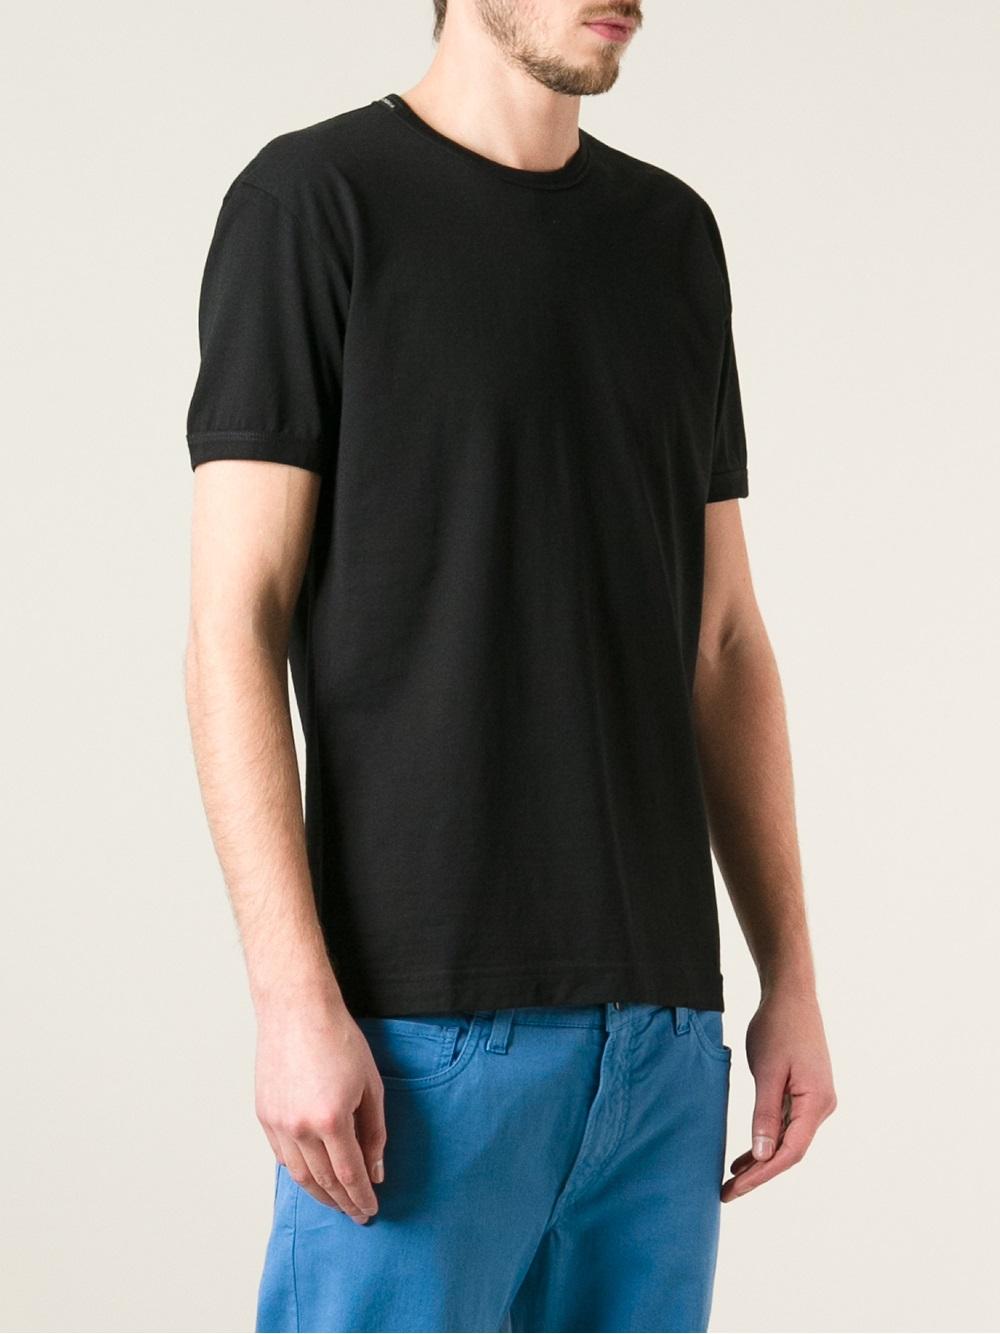 Dolce & Gabbana Crew Neck Tshirt in Black for Men